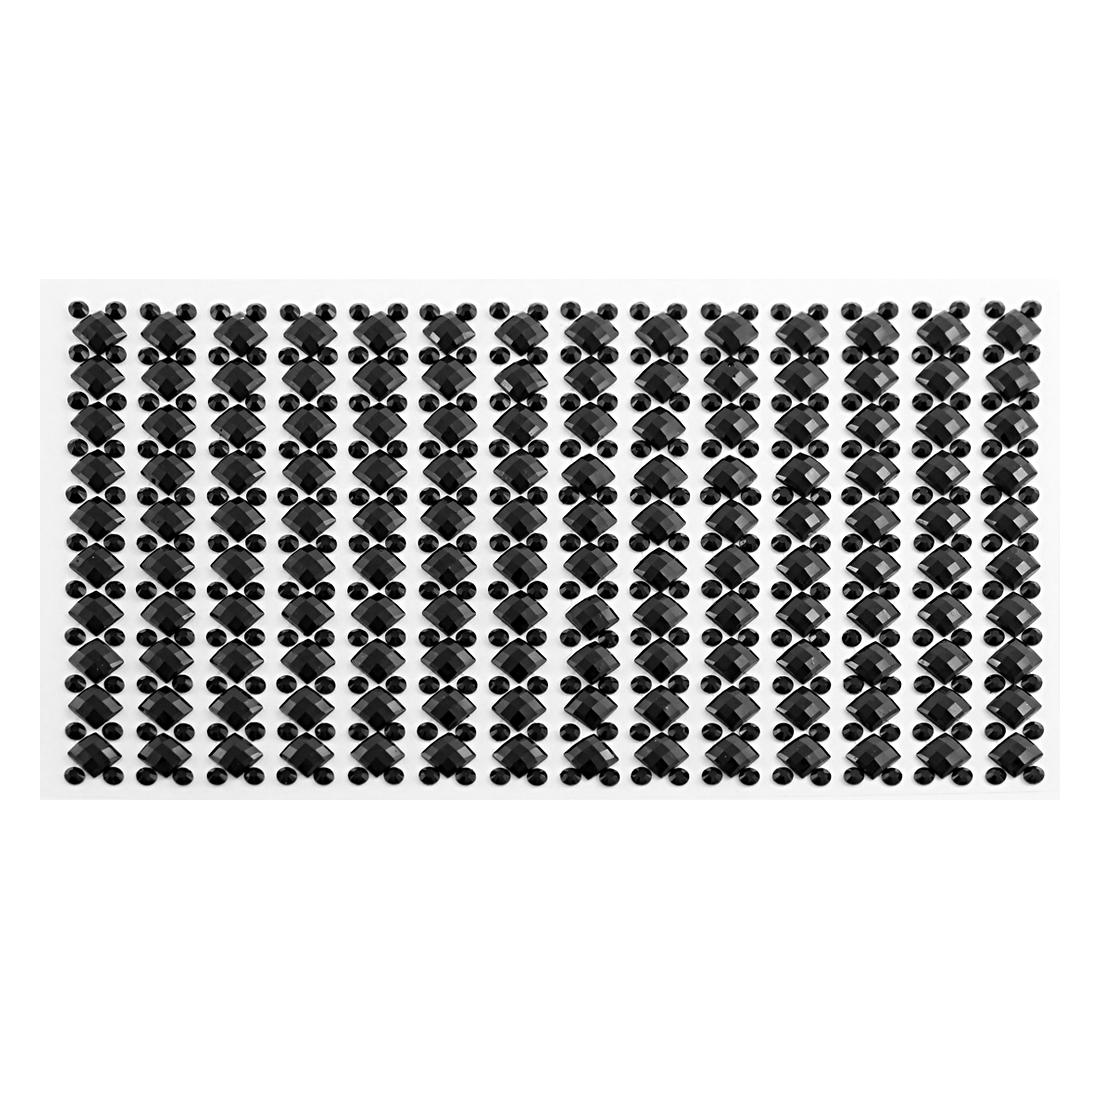 Round Square Black Faux Crystal Rhinestone Acrylic Sticker Car Decals